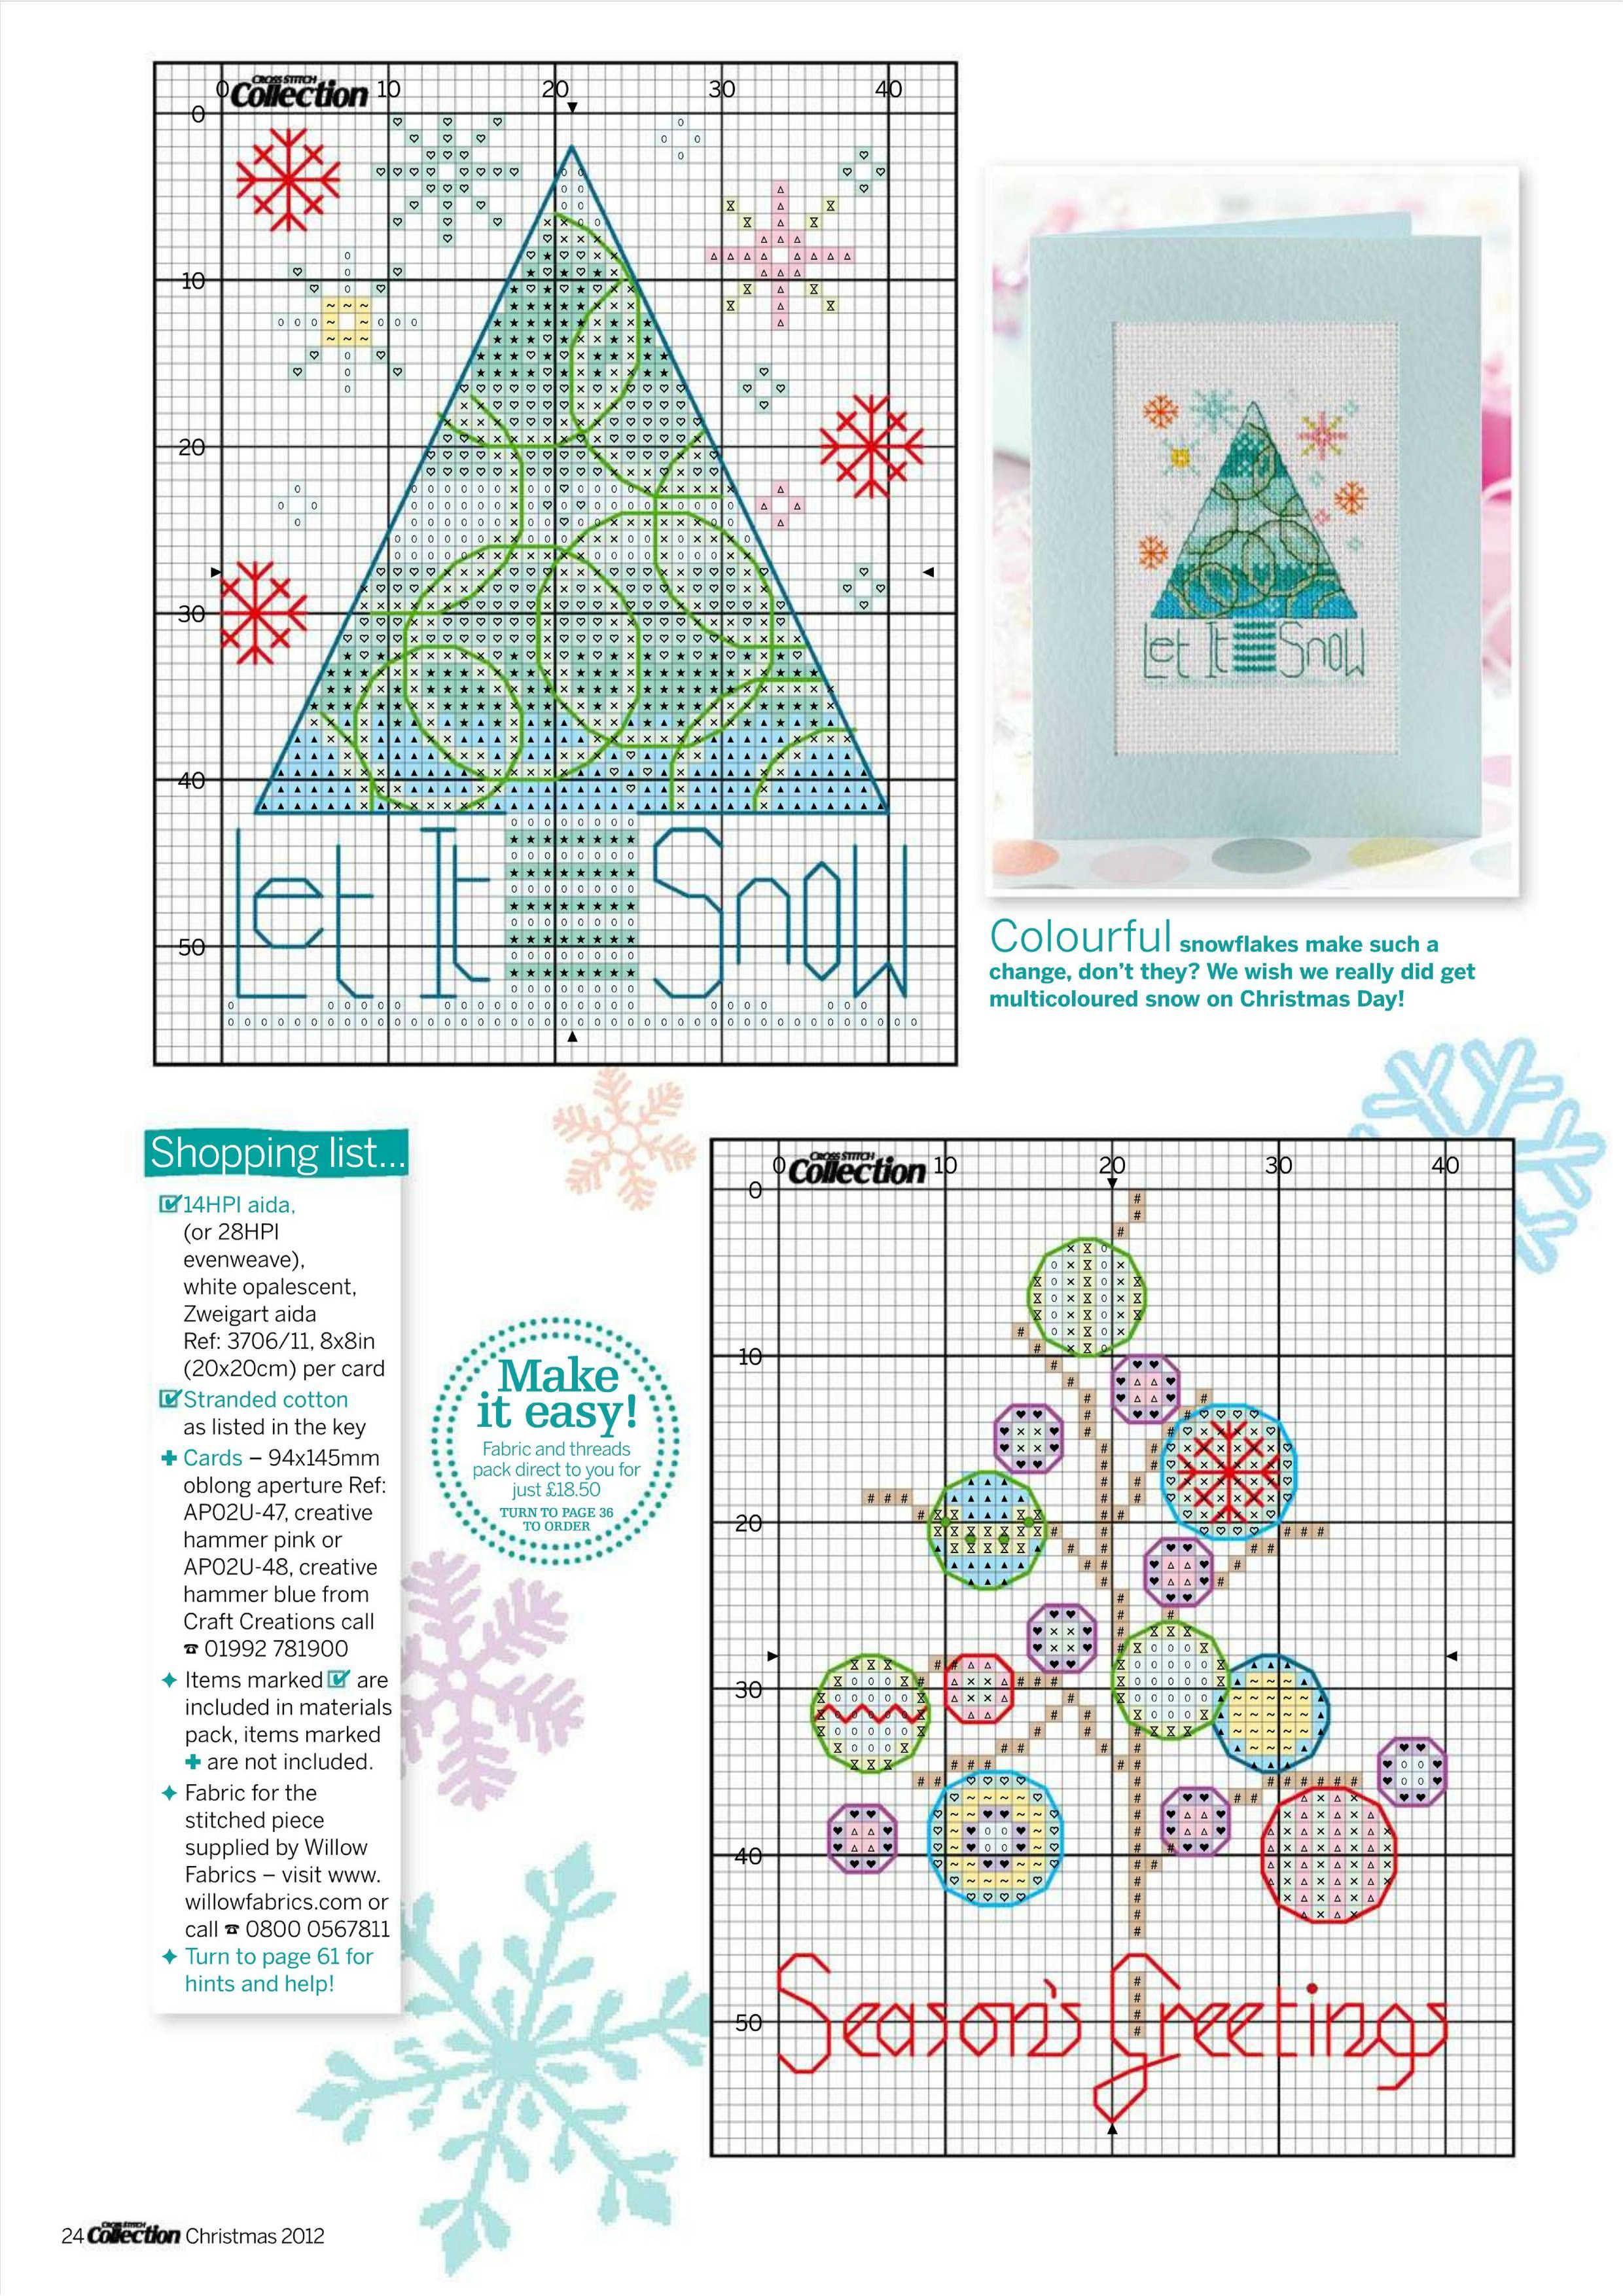 Pin de Goranka en Christmas cross-stitch II | Pinterest | Punto de ...